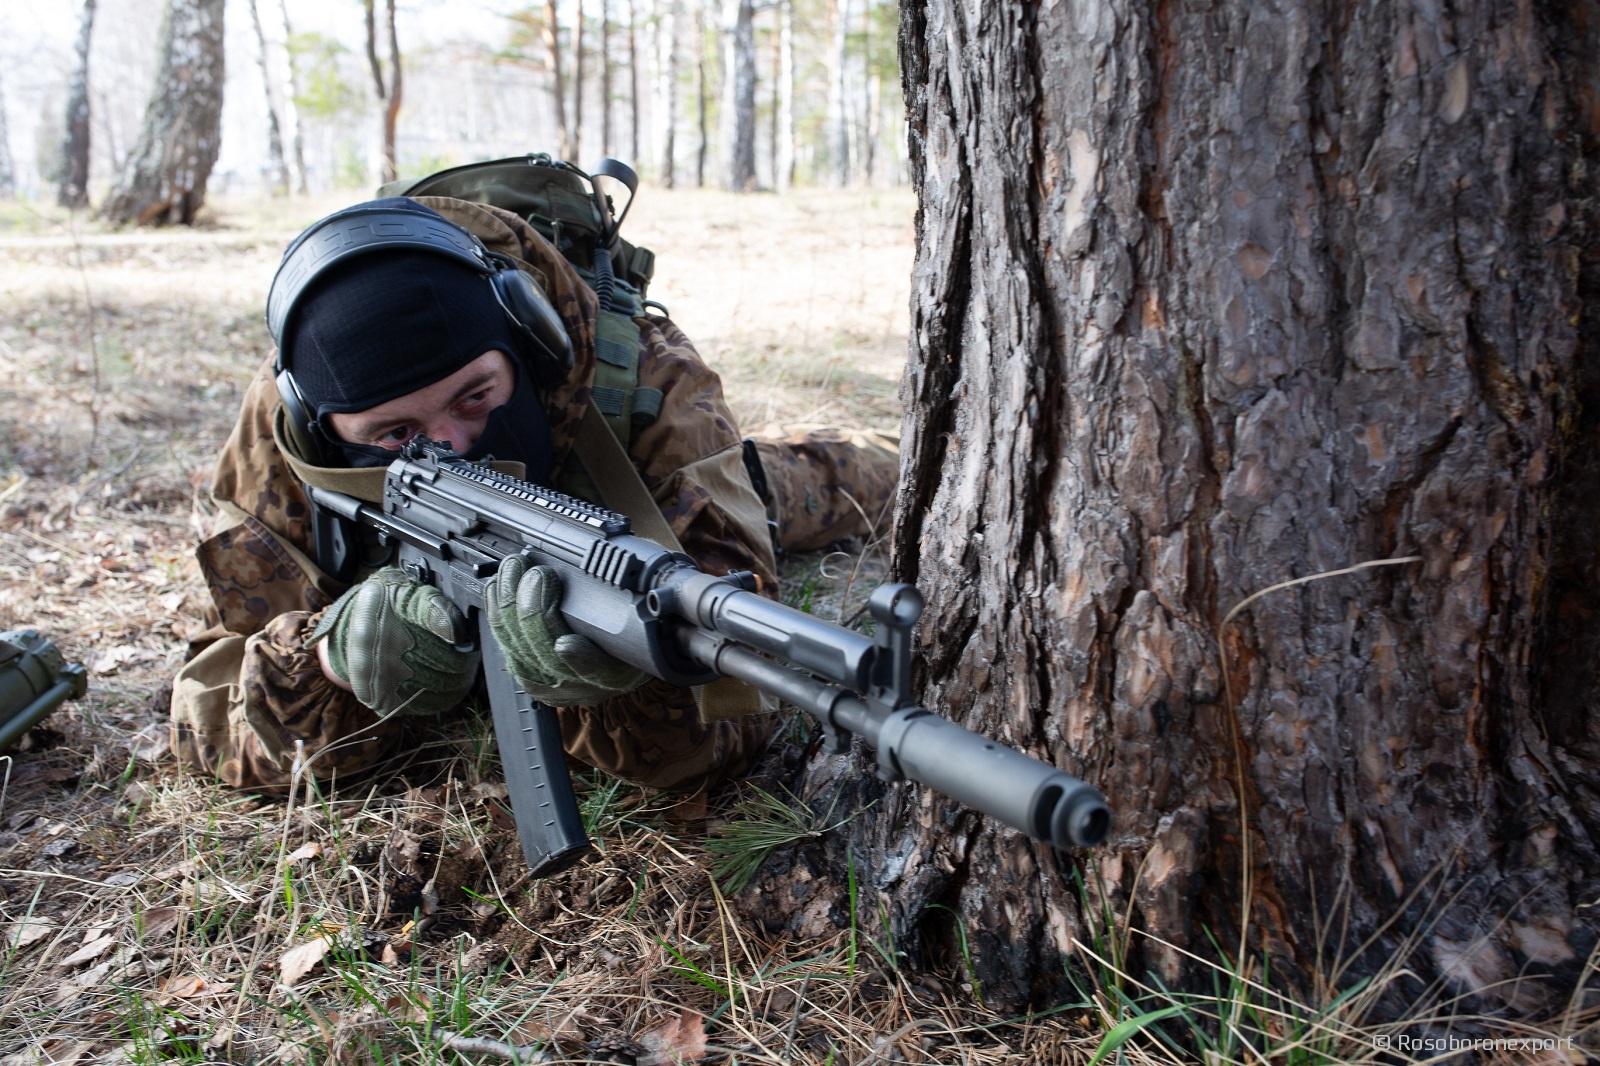 Russian Assault Rifles/Carbines/Machine Guns Thread: #2 - Page 10 13c53e645f68301f5d92886c145bde19